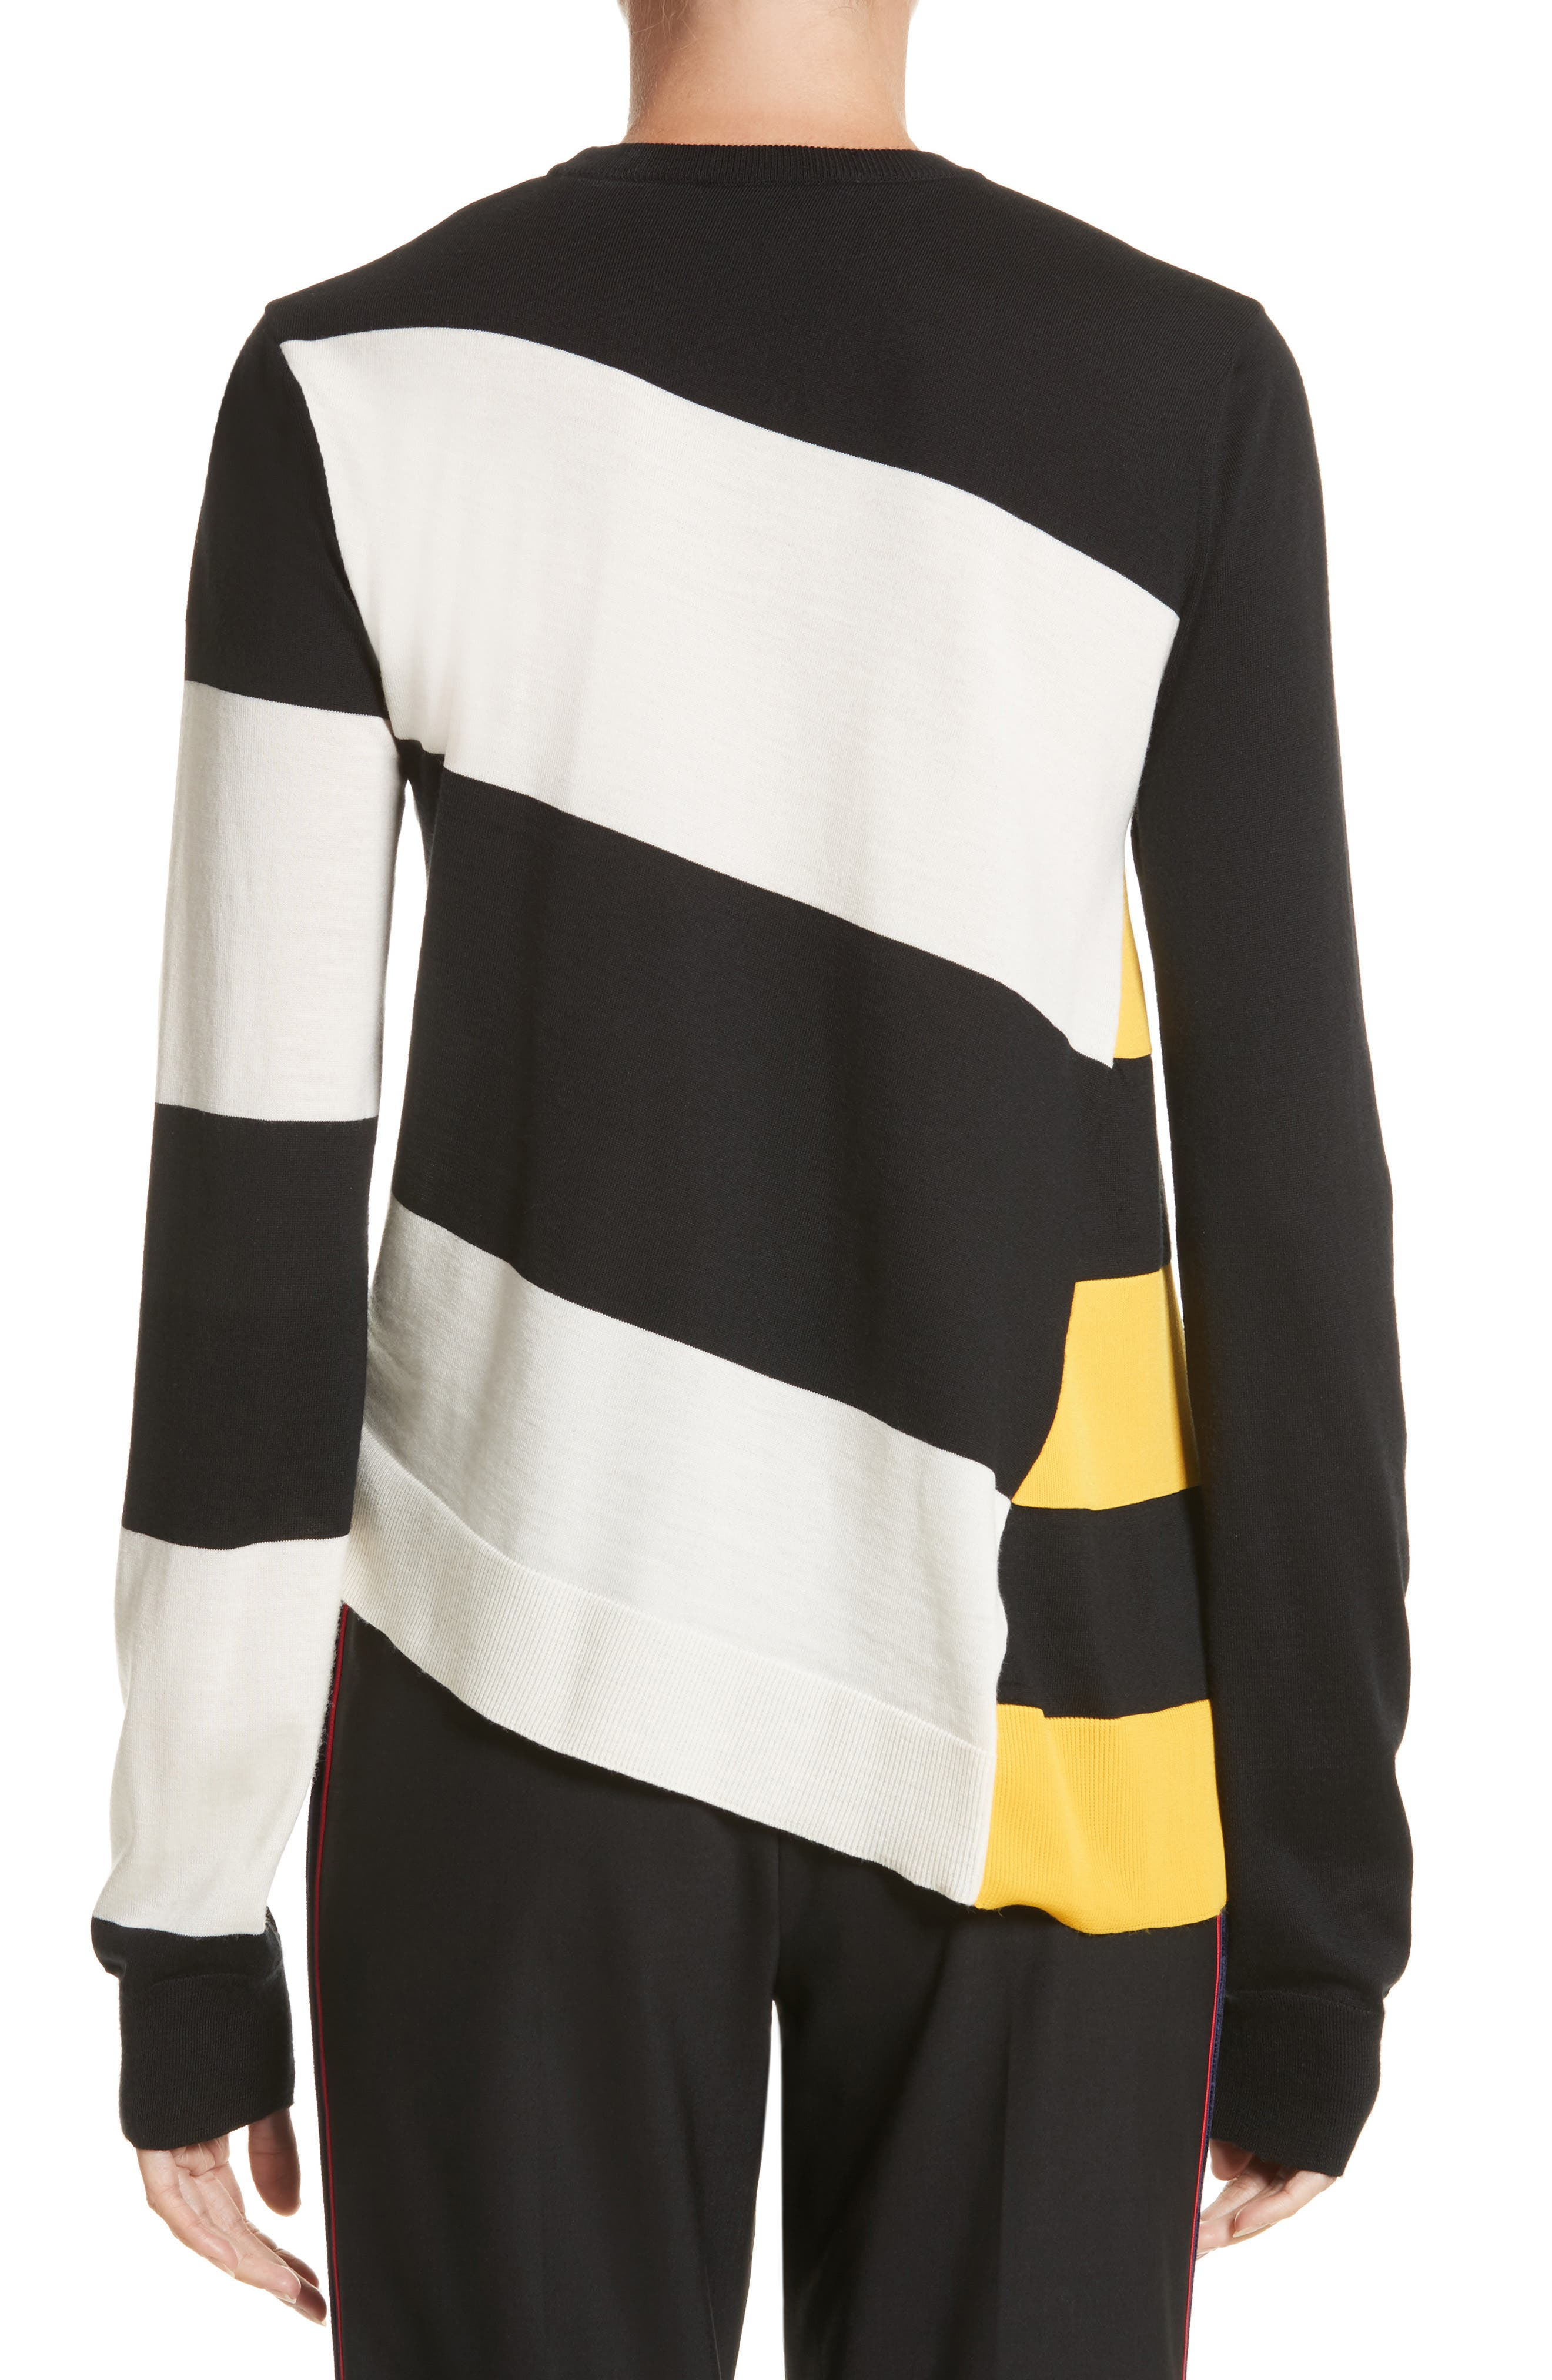 Bicolor Stripe Merino Wool Blend Sweater,                             Alternate thumbnail 2, color,                             Black/ Off White/ Yellow